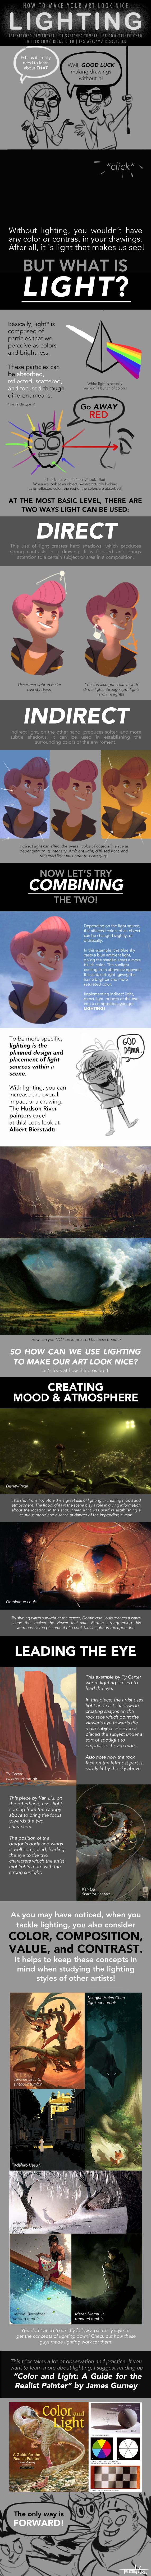 HOW TO MAKE YOUR ART LOOK NICE: Lighting